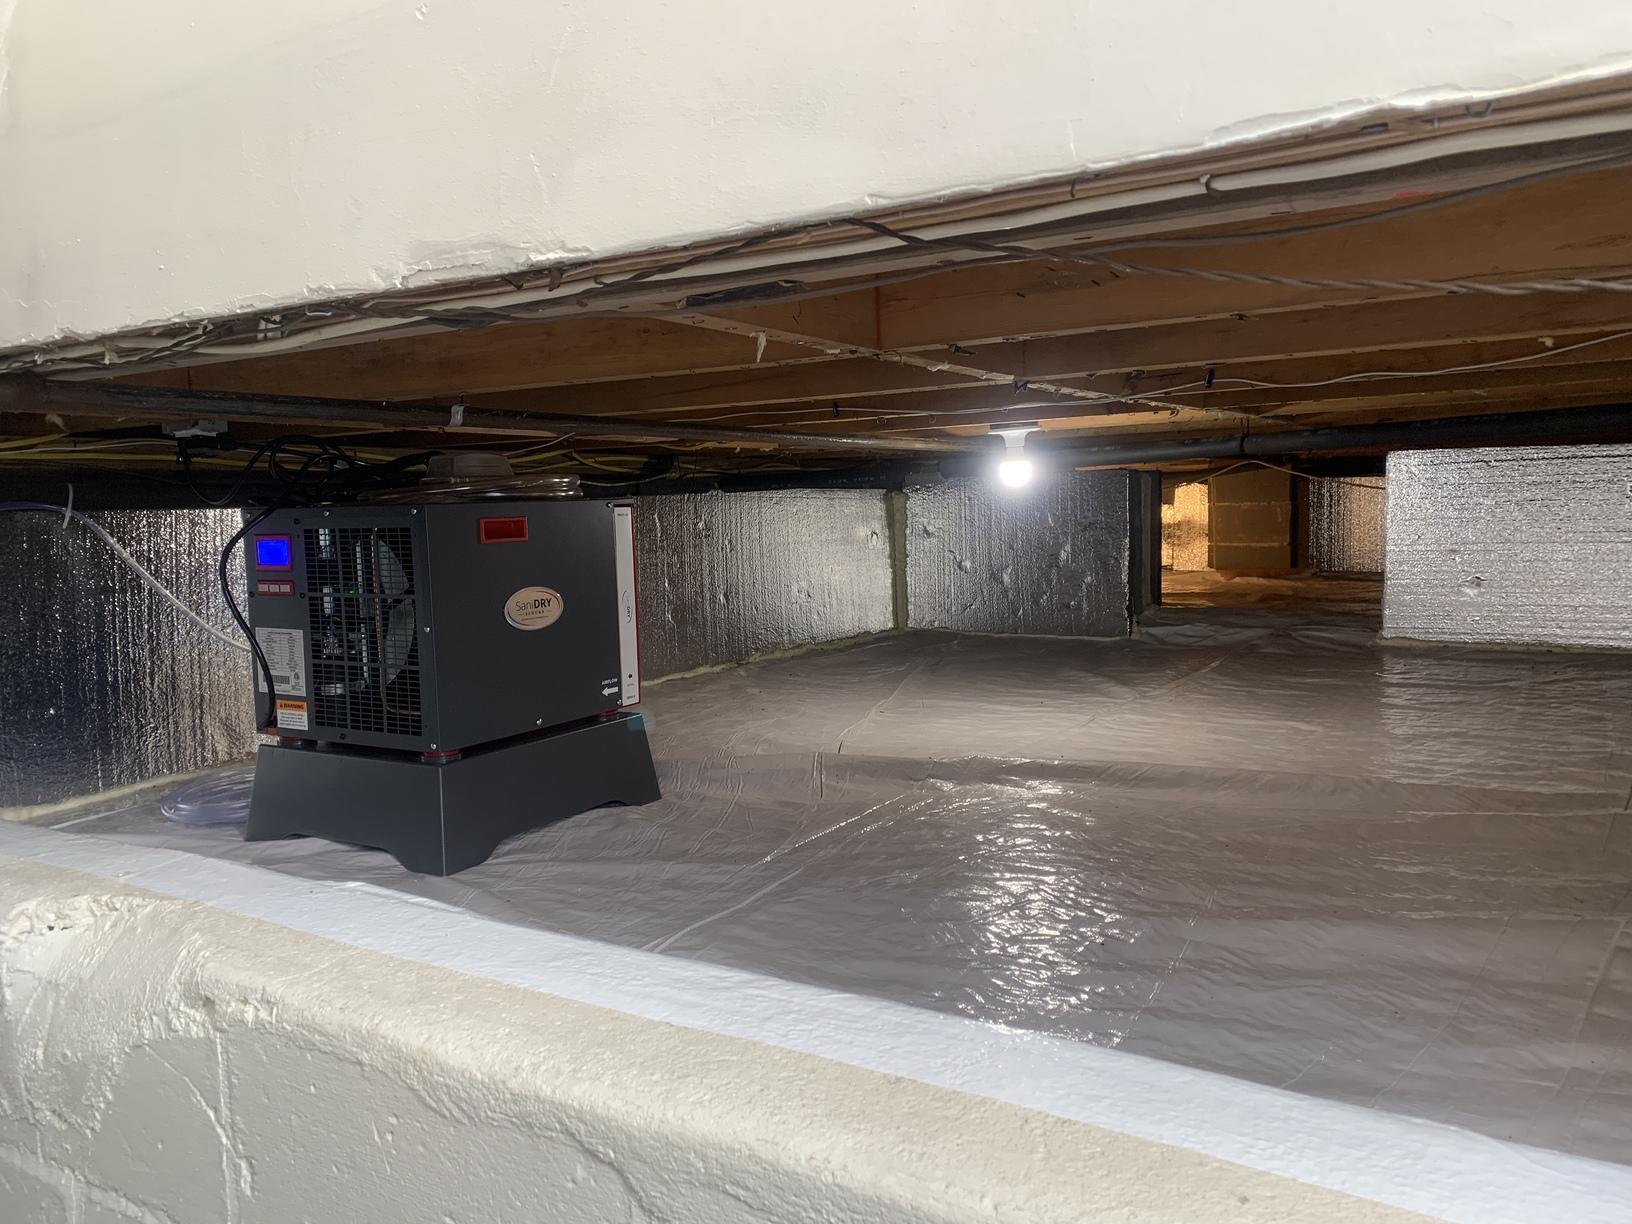 Crawlspace Encapsulation and SaniDry Sedona- Bay Shore, NY